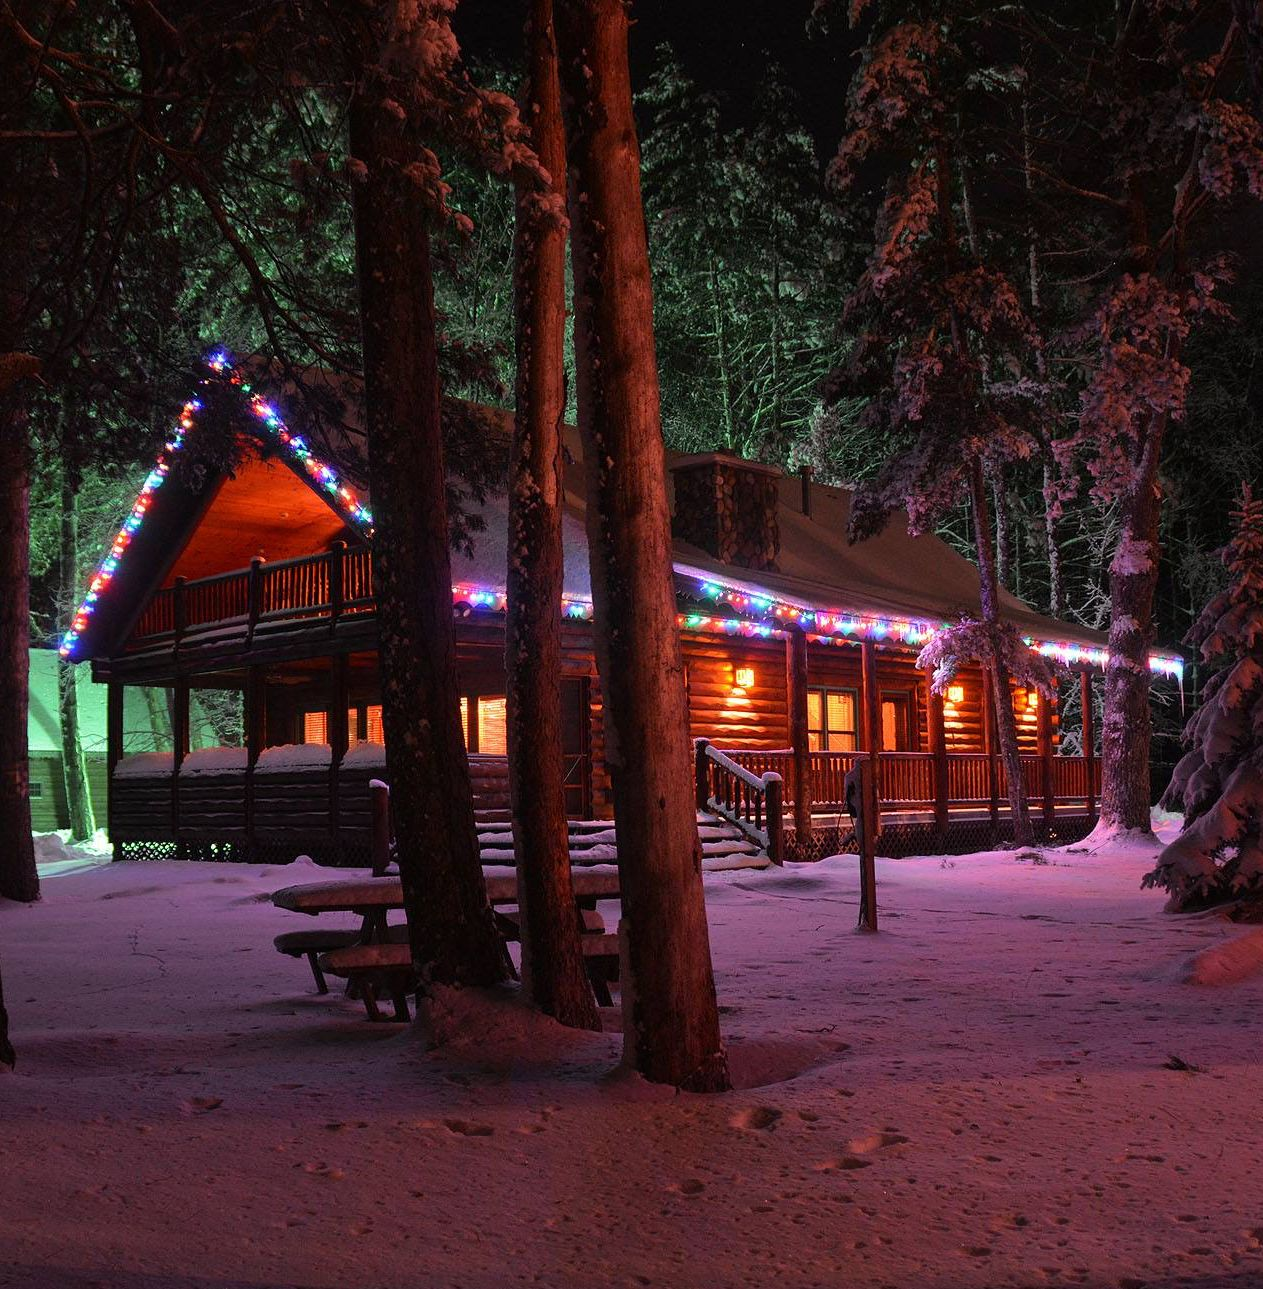 Wisconsin Winter Cabin Rental Travel Wisconsin Winter Cabin Rentals Winter Cabin Resorts In Wisconsin